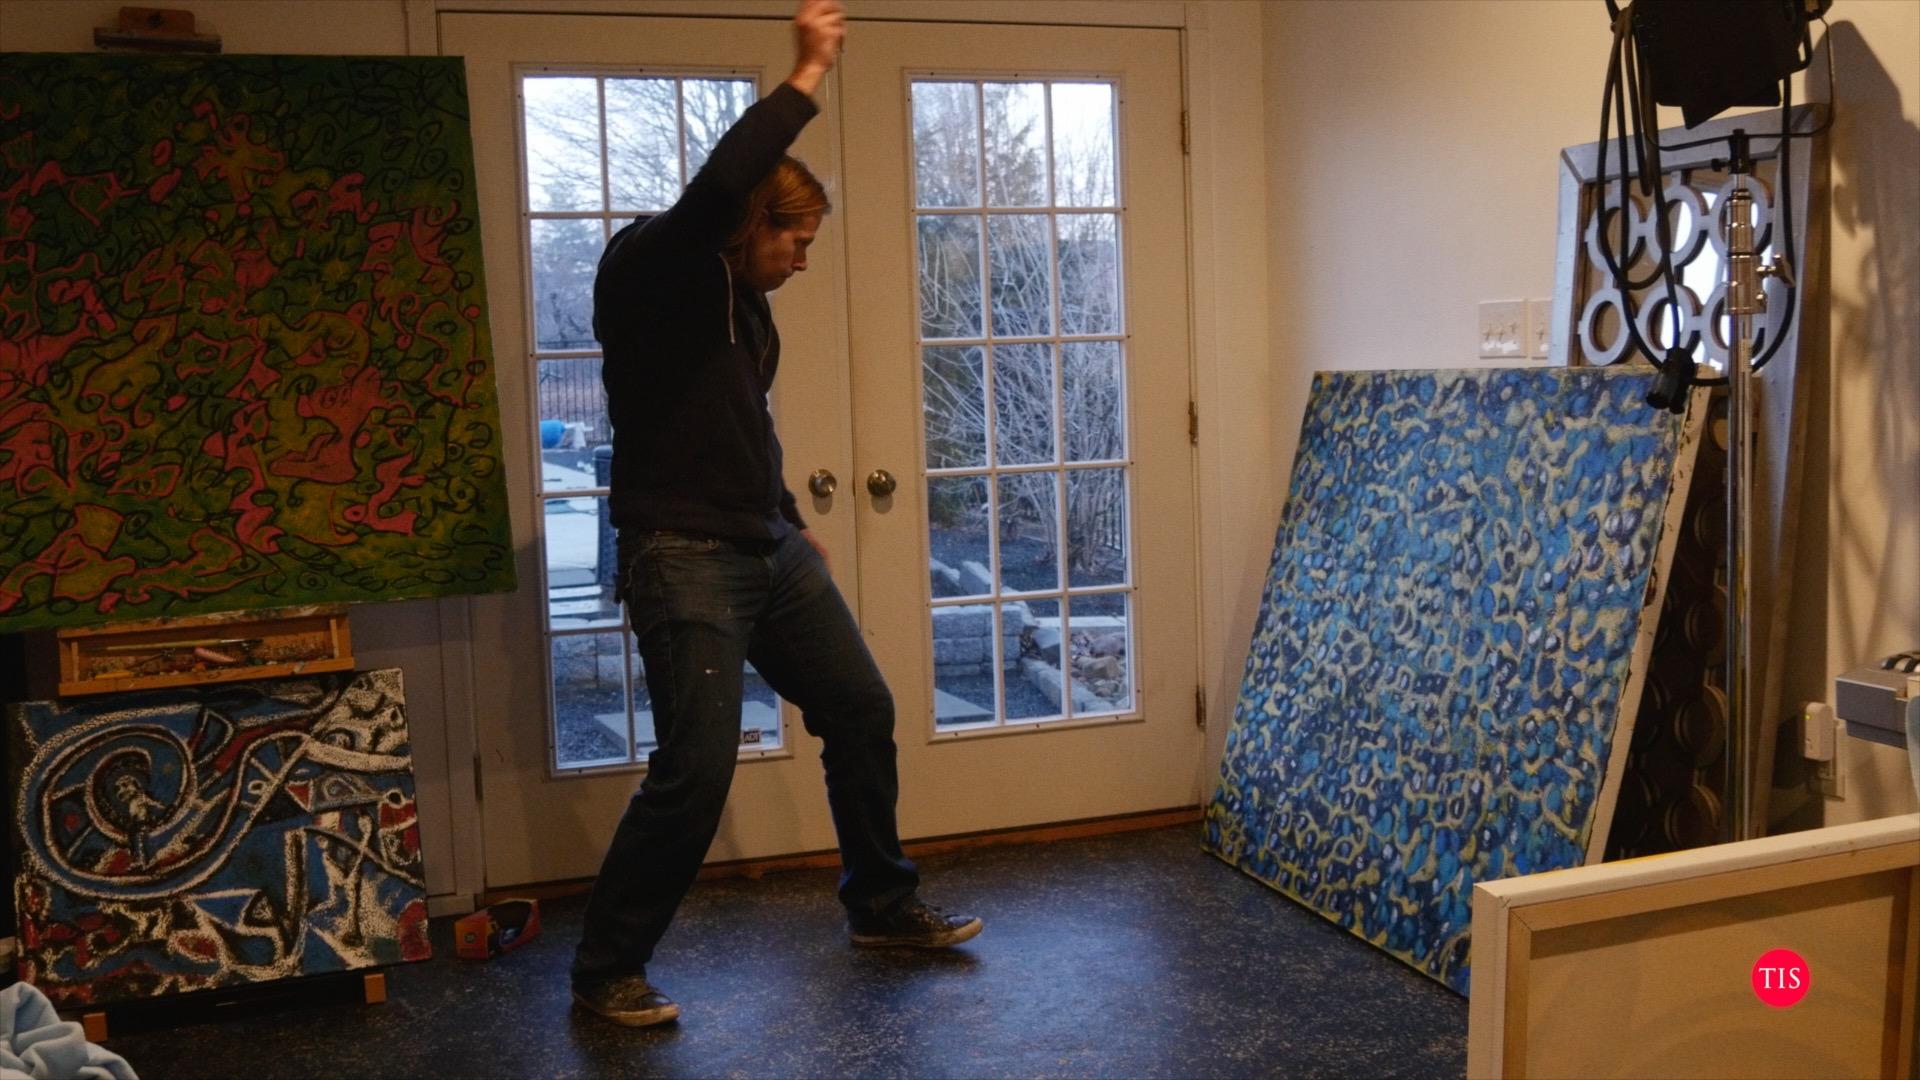 Charles dancing to reggae music while painting.